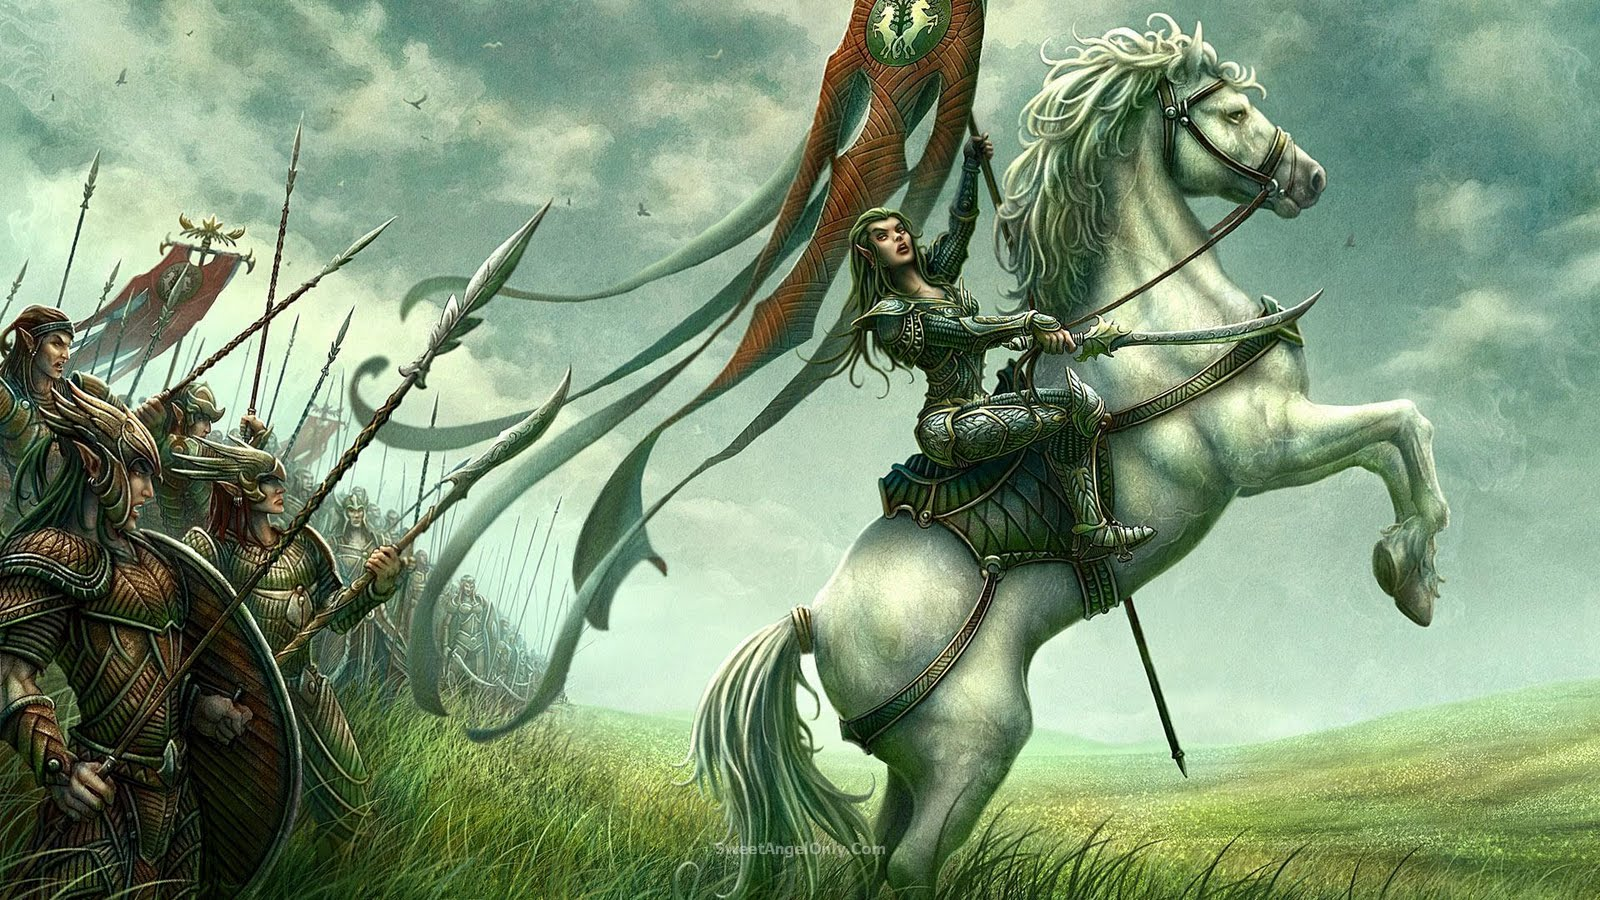 Wonderful   Wallpaper Horse Samsung Galaxy - beautiful_fantasy_wallpaper_40  Perfect Image Reference_69532.jpg